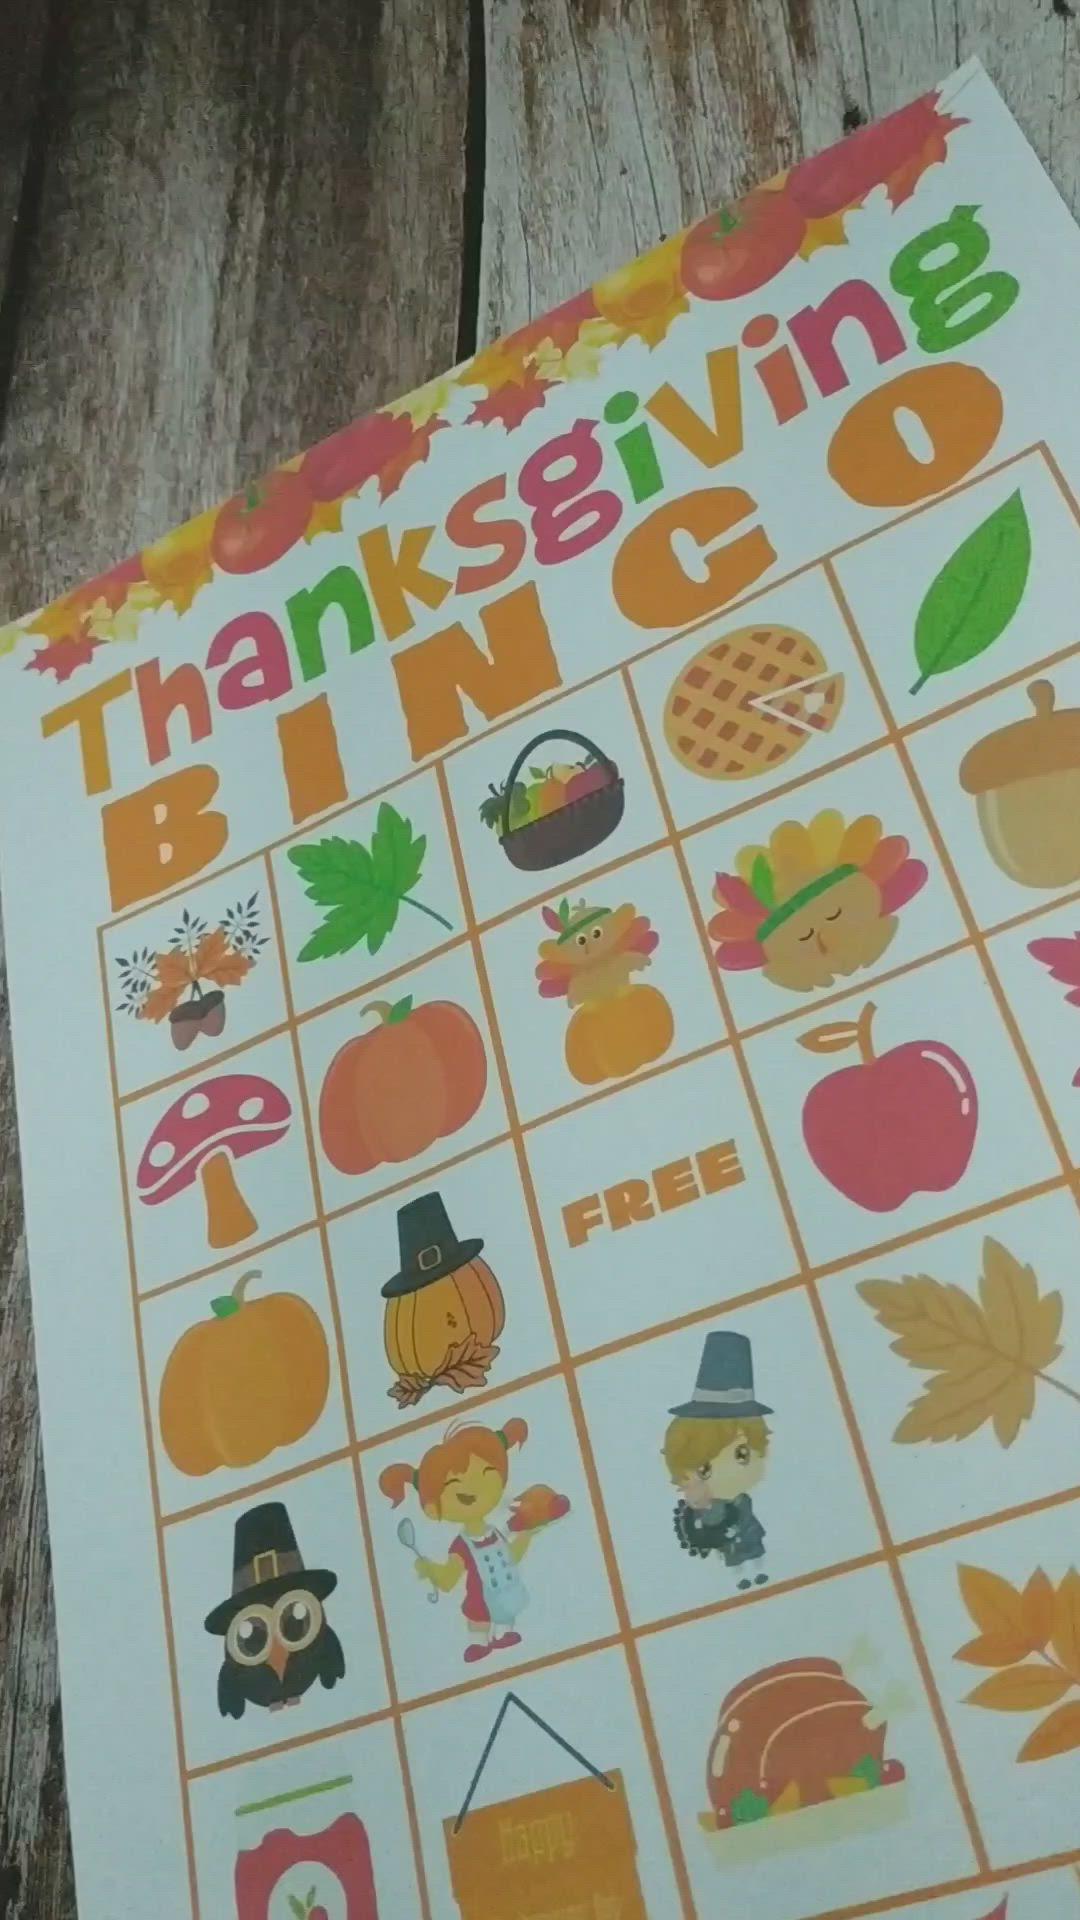 Thanksgiving Games For Preschoolers Thanksgiving Games To Play Video Thanksgiving Activities Thanksgiving Scavenger Hunt Preschool Games [ 1920 x 1080 Pixel ]